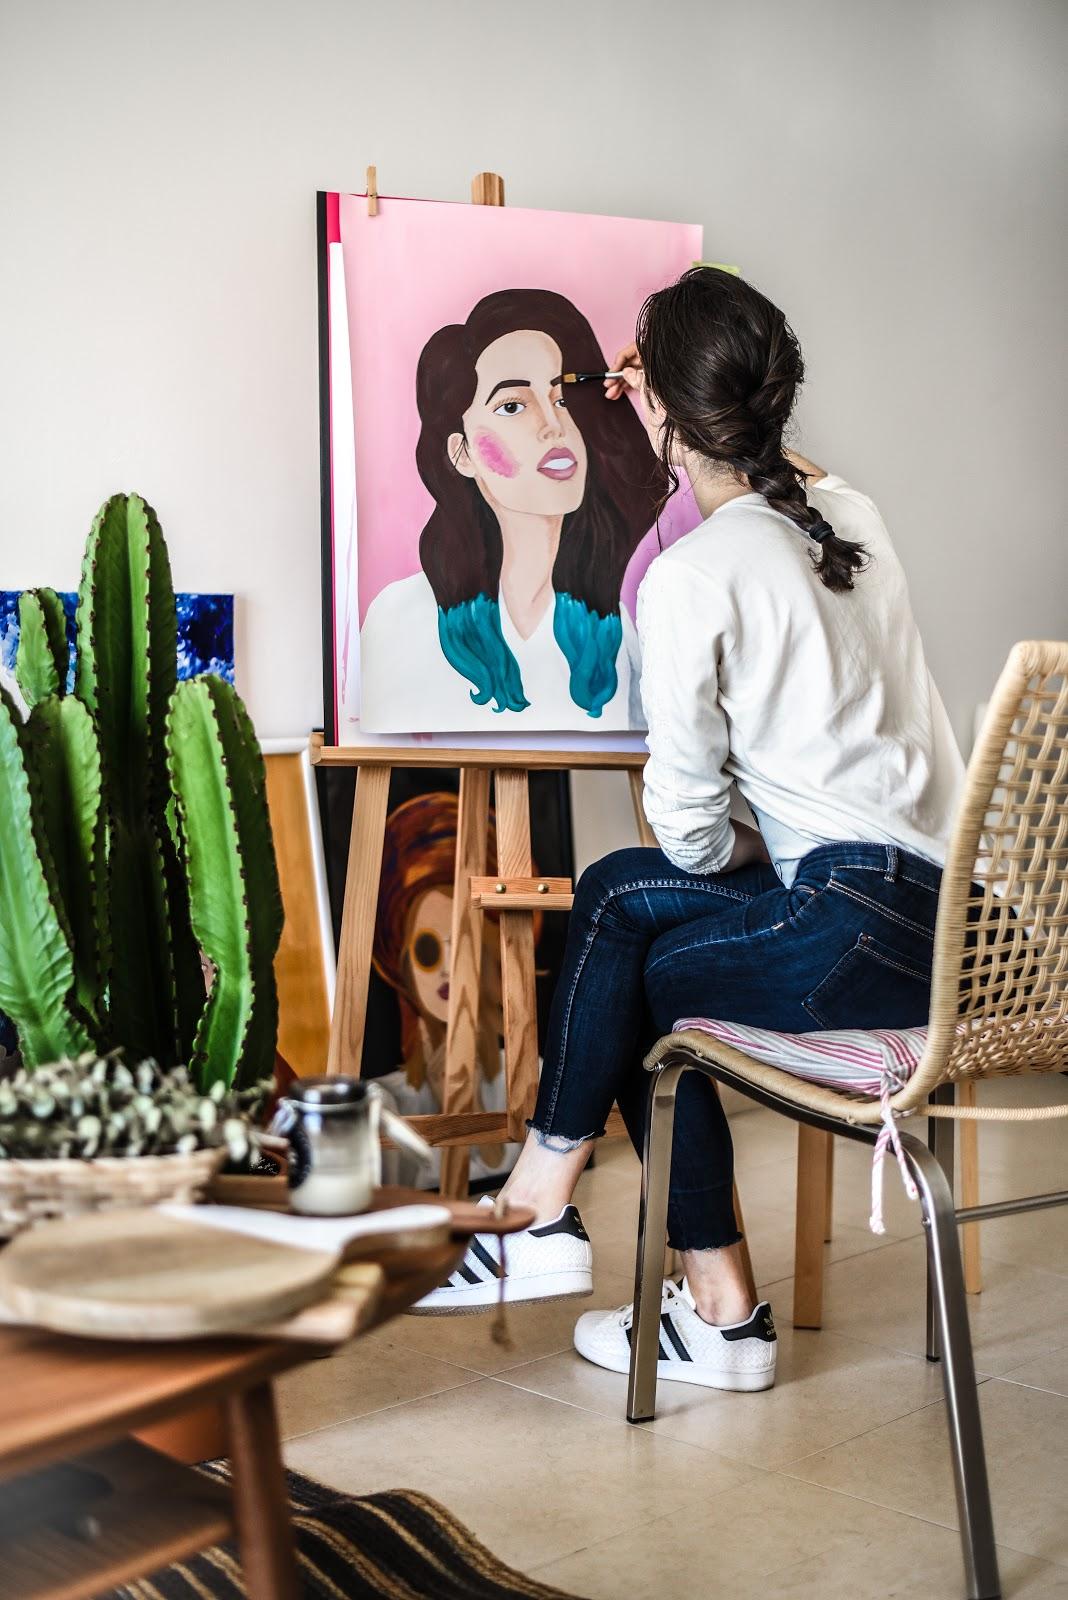 Artist_work_in_progress_illustration_home